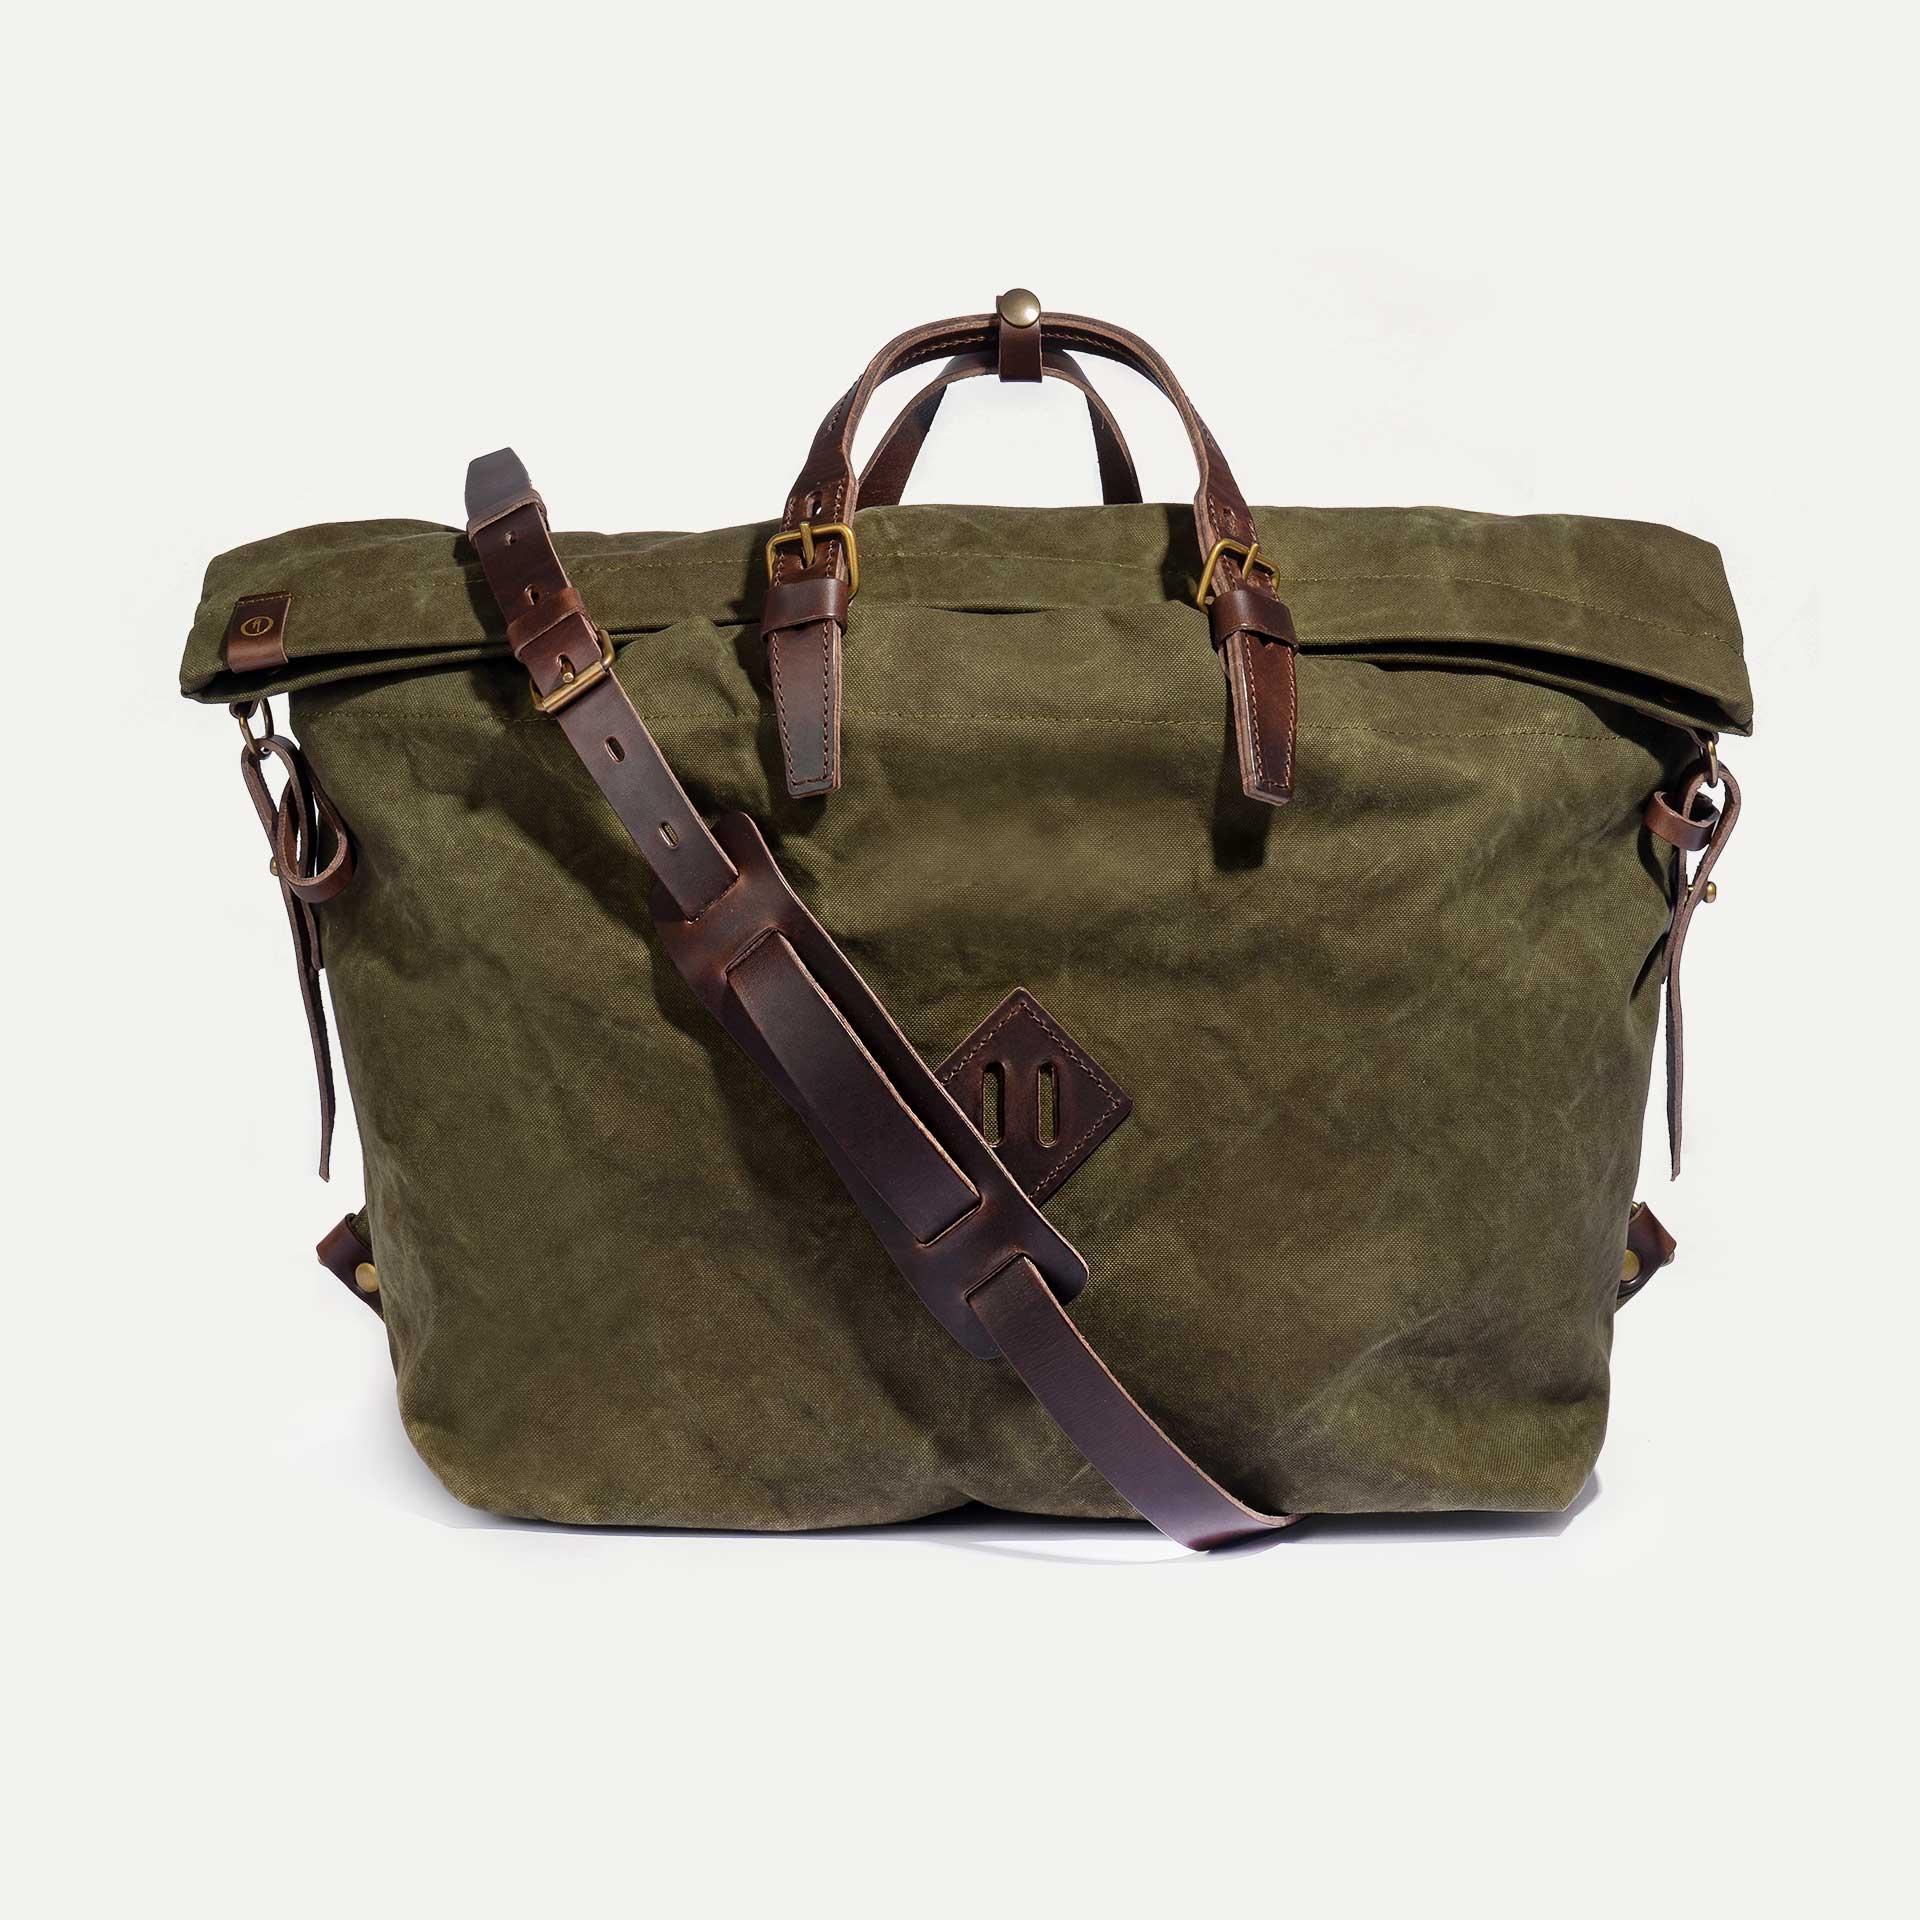 Woody L Backpack - Dark Khaki (image n°1)